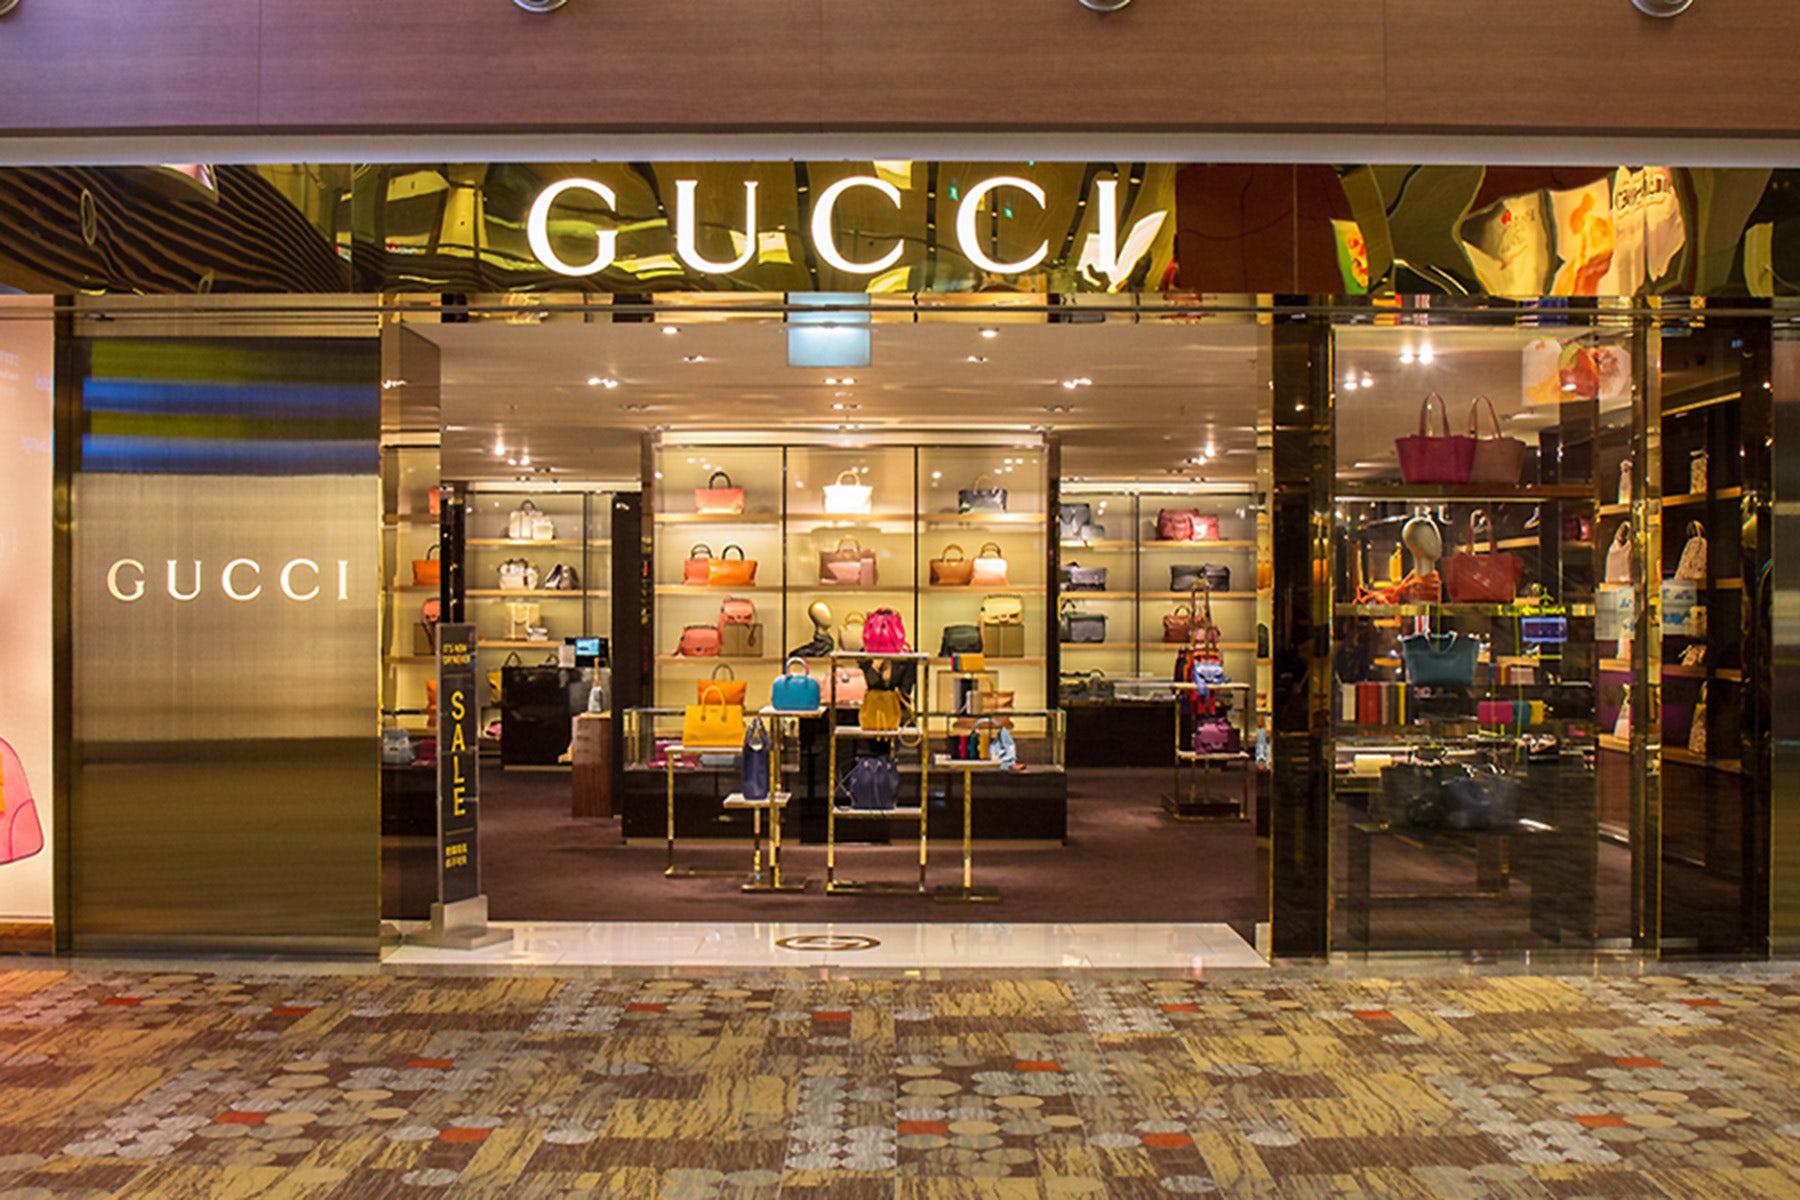 Gucci store | Source: Shutterstock